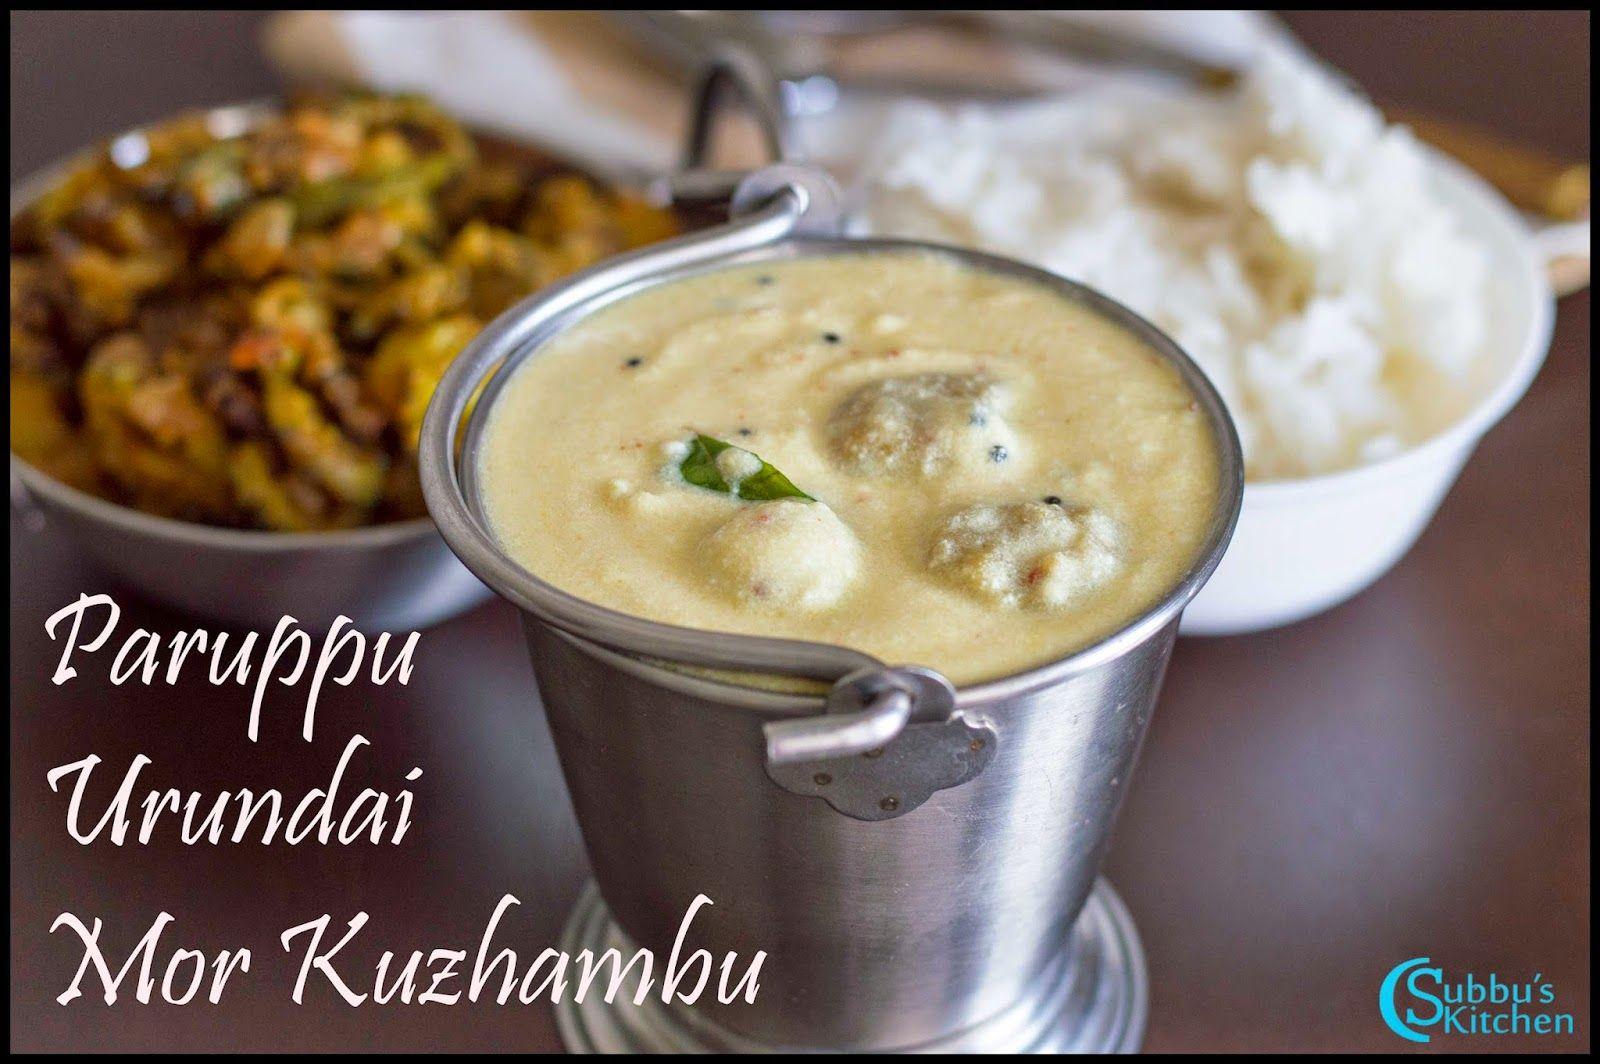 Paruppu Urundai Mor Kuzhambu Recipe Food Recipes Cooking Indian Food Recipes